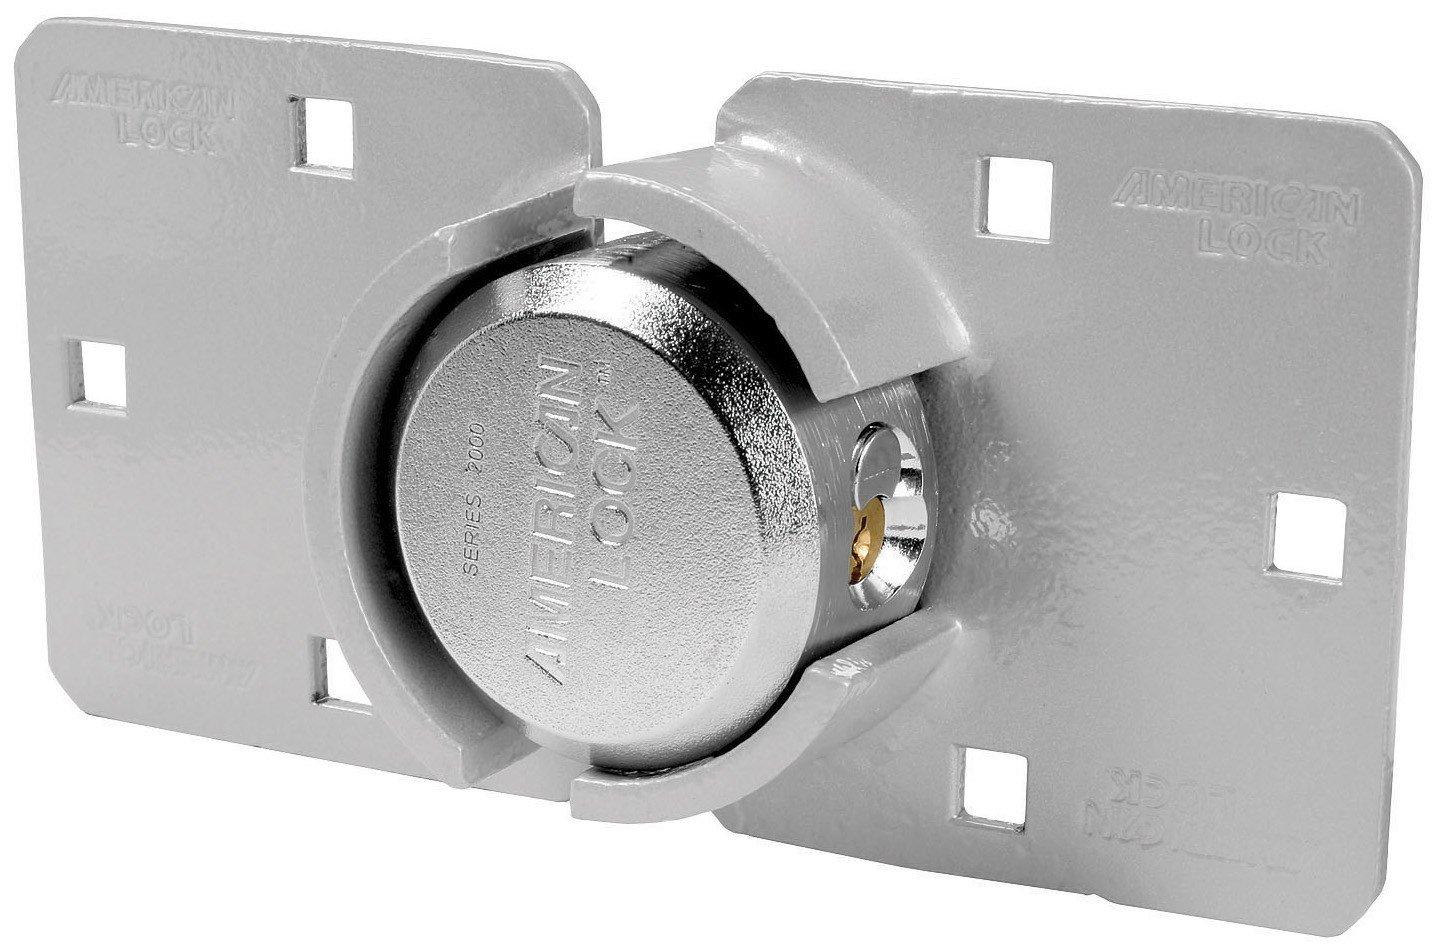 American Lock A800LHCD 2 7/8'' High Security Hasp Shackle Lock